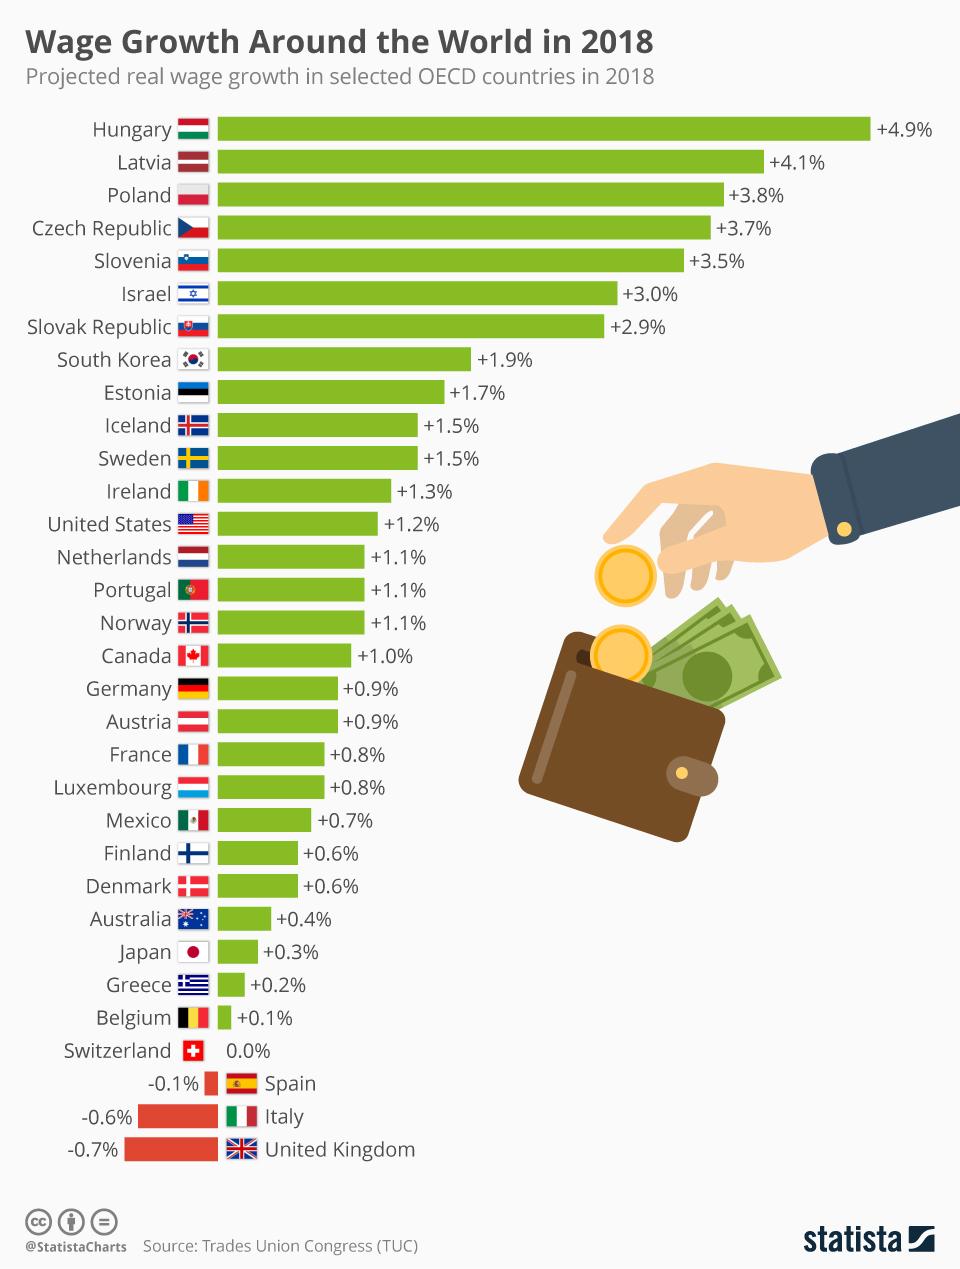 chartoftheday_12407_wage_growth_around_the_world_in_2018_n.jpg